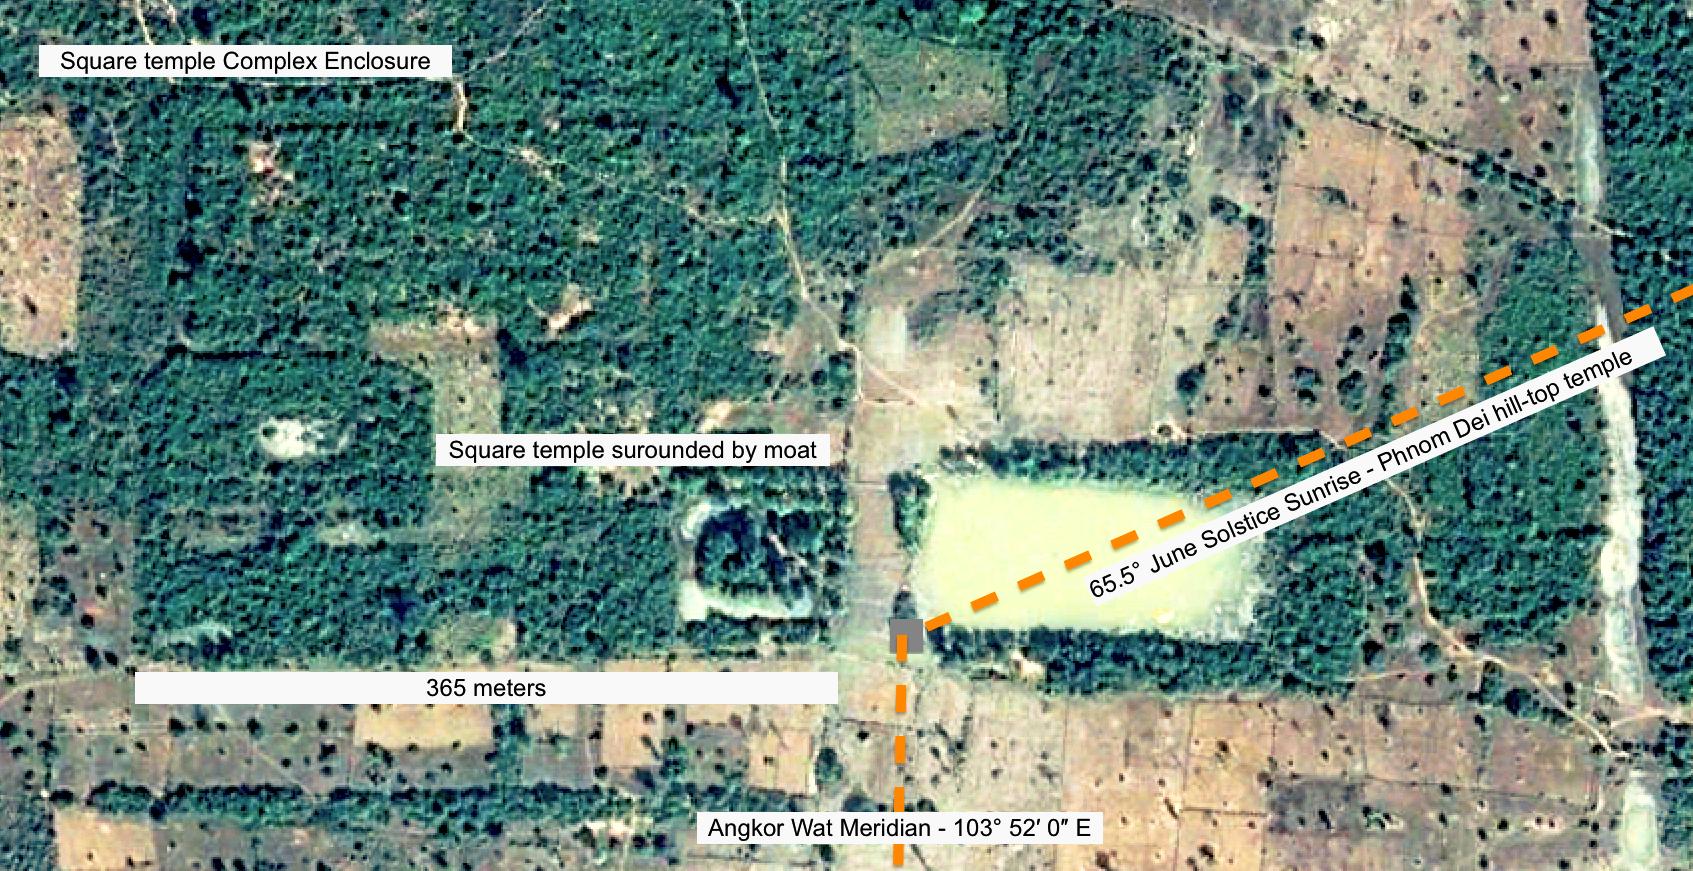 Figure 9: June solstice alignment to Phnom Dei Hill and temple.